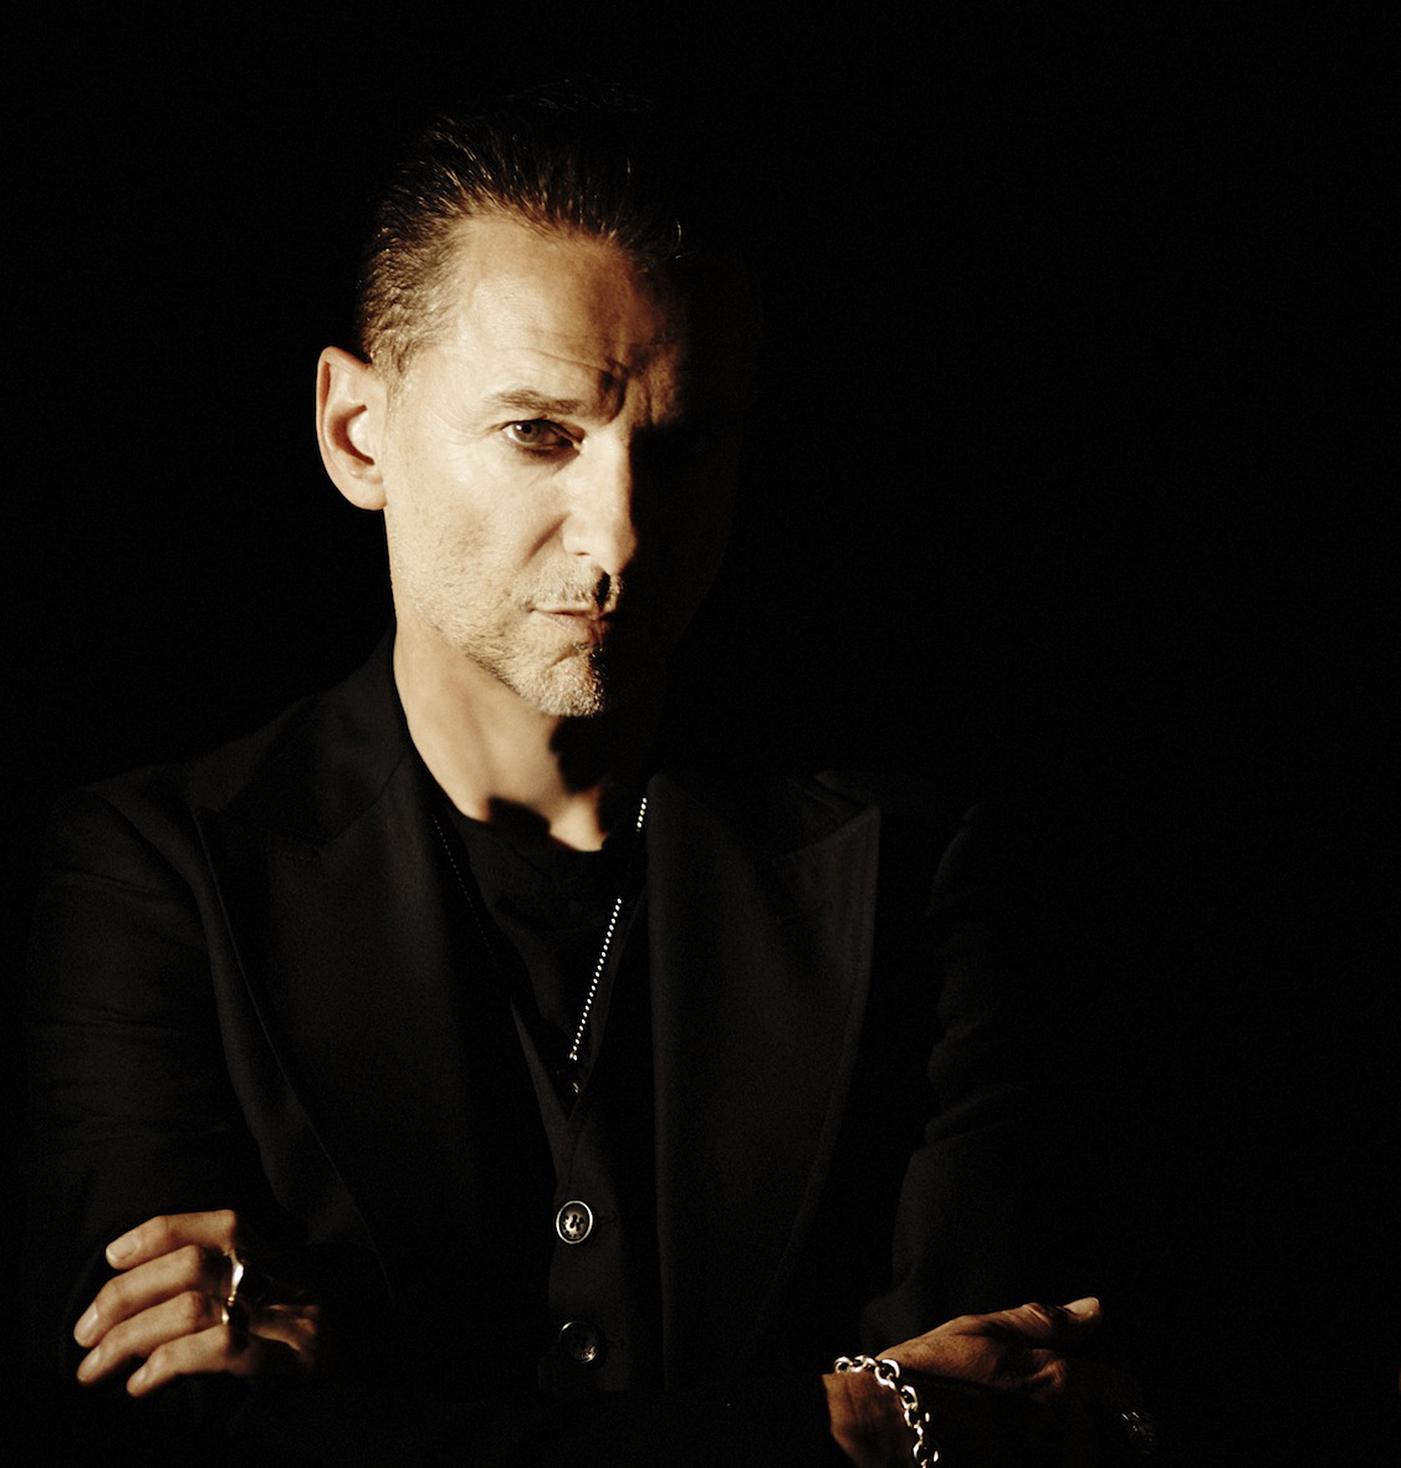 Dave Gahan on Soulsavers, Depeche Mode's Future, Trashy TV ...